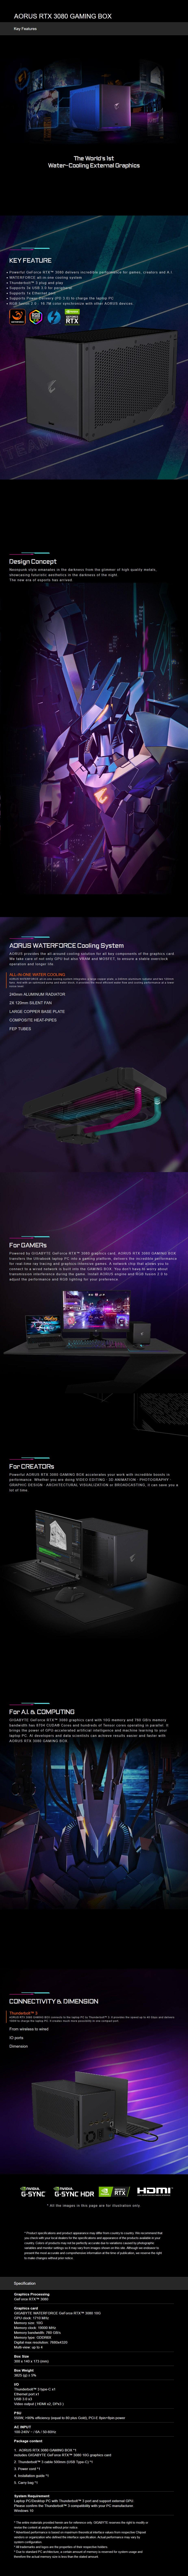 Gigabyte AORUS GeForce RTX 3080 WATERFORCE 10GB Gaming Box - Desktop Overview 1